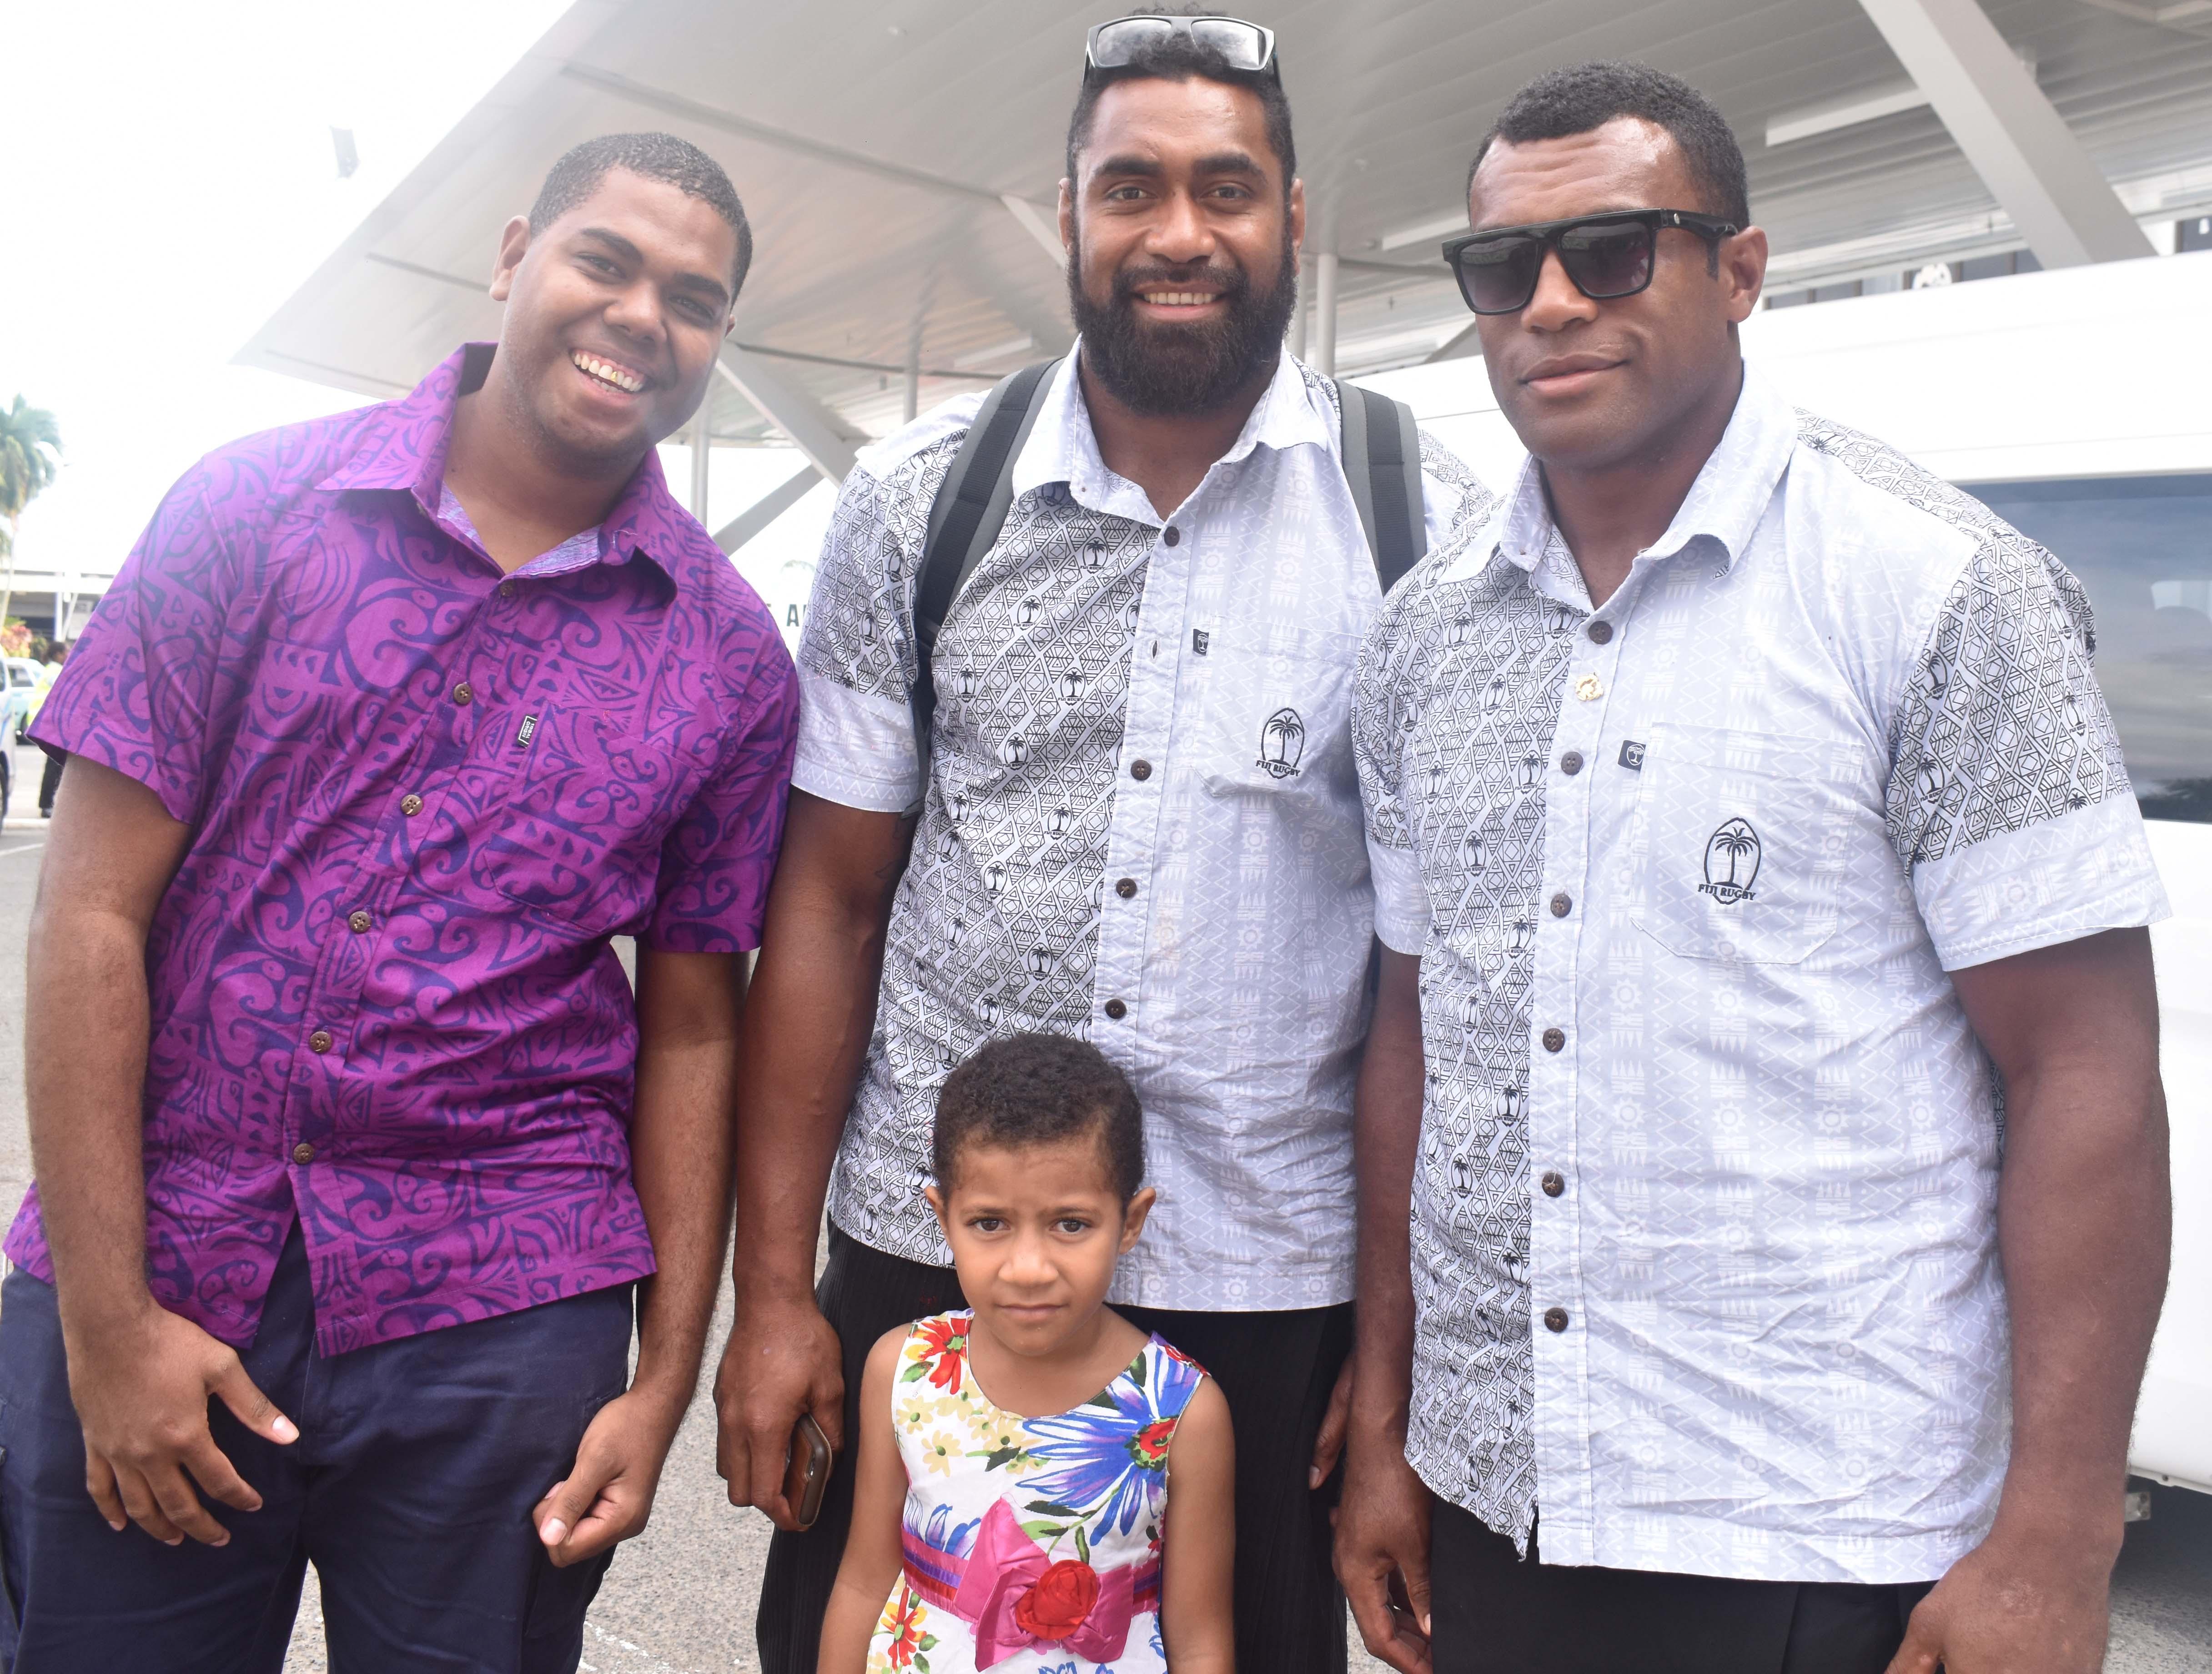 Vodafone Flying Fijians Tevita Cavubati (second from left) and Nemani Nagusa (right) with fans at the Nadi International Airport. Photo: Waisea Nasokia